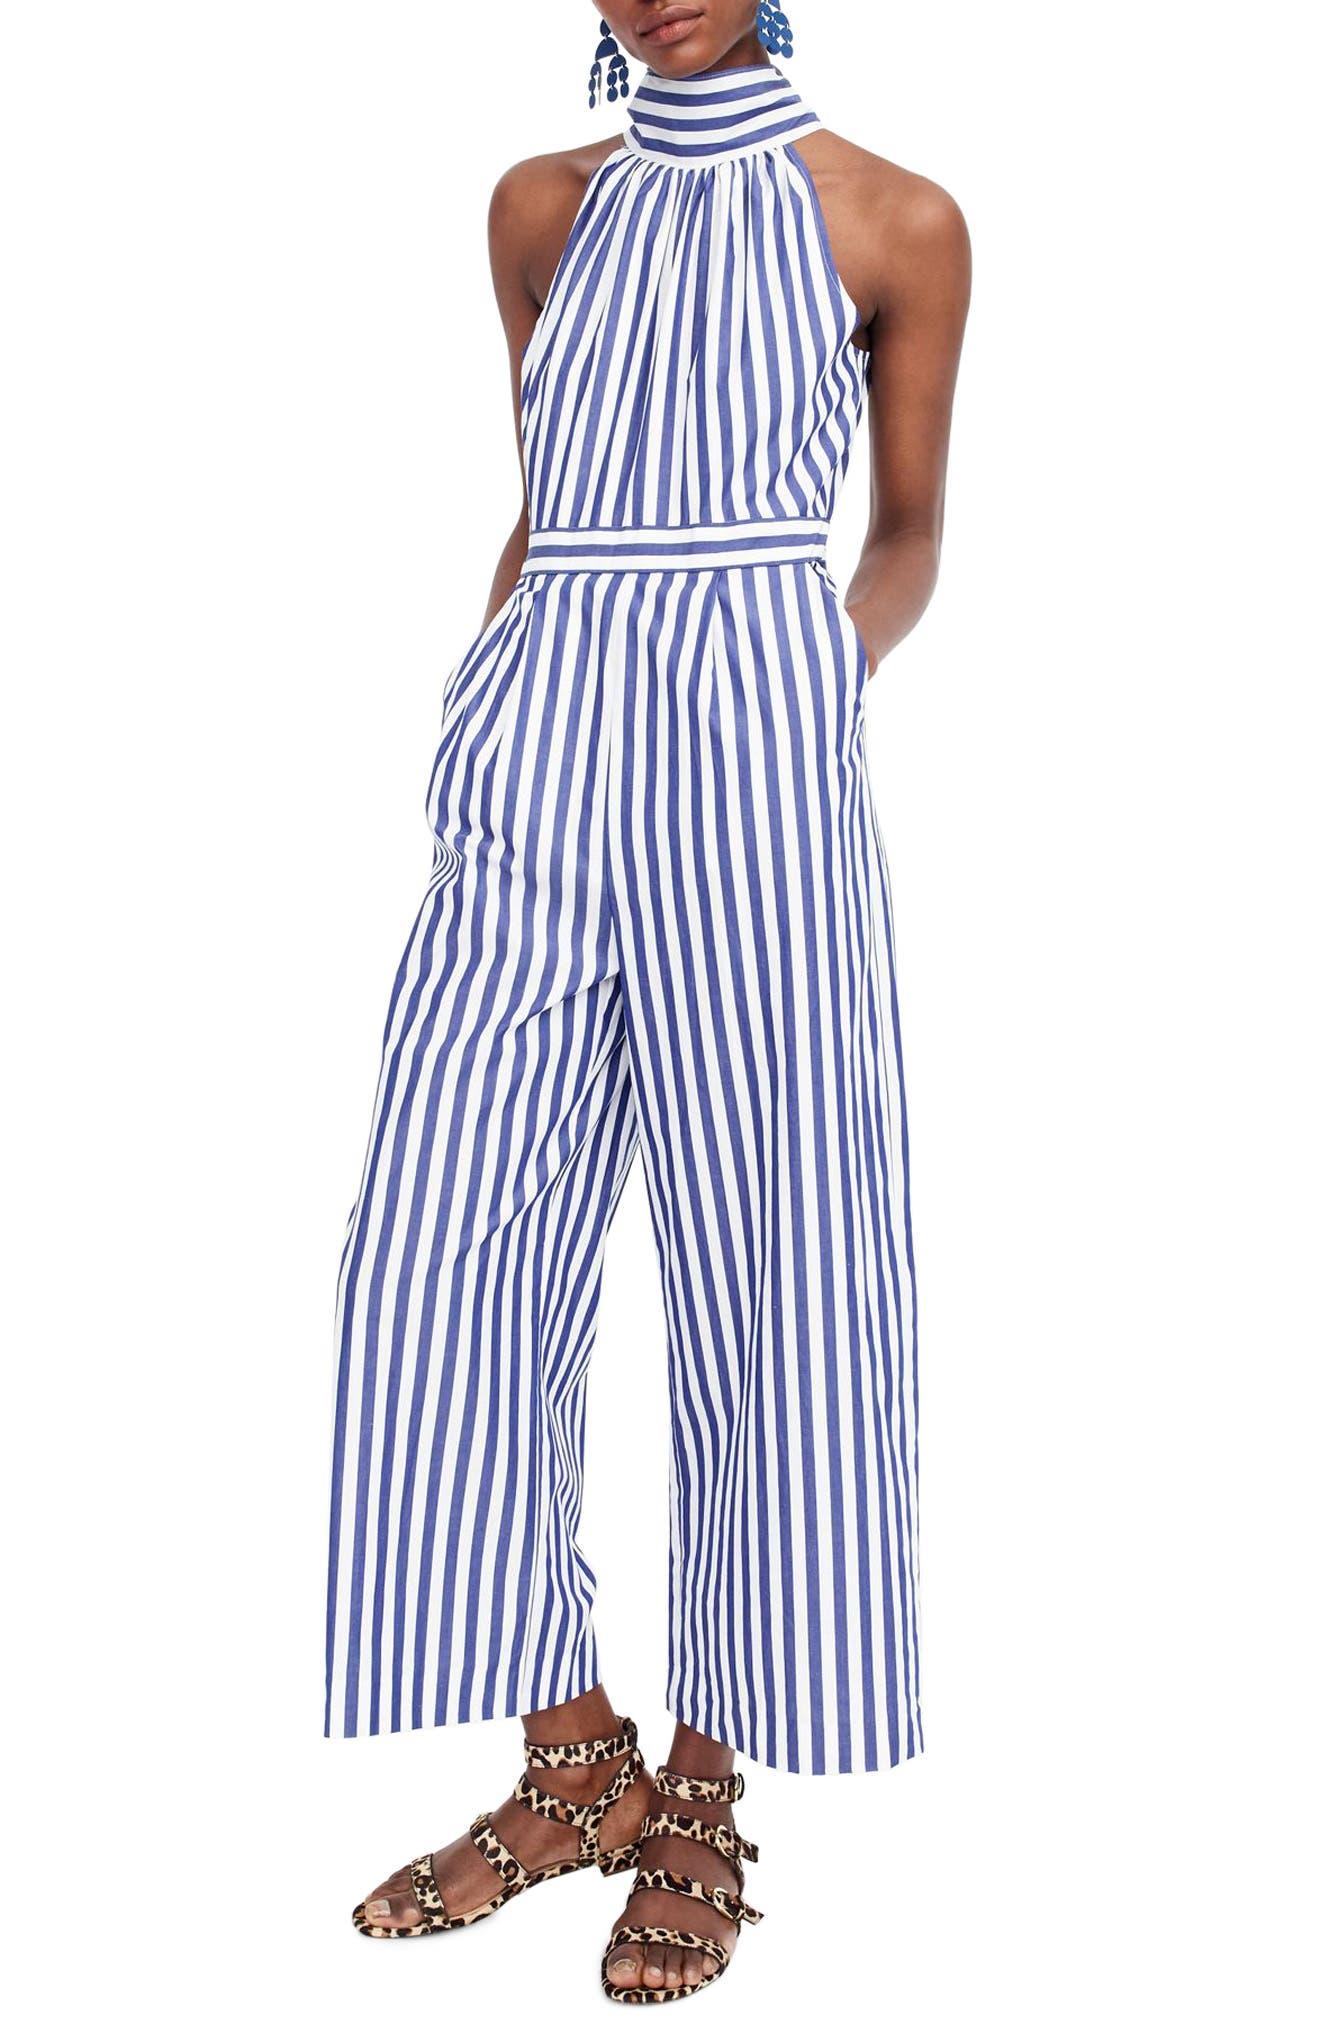 J.CREW, Stripe Halter Wide Leg Jumpsuit, Main thumbnail 1, color, TUSHAR STRIPE LIGHTHOUSE